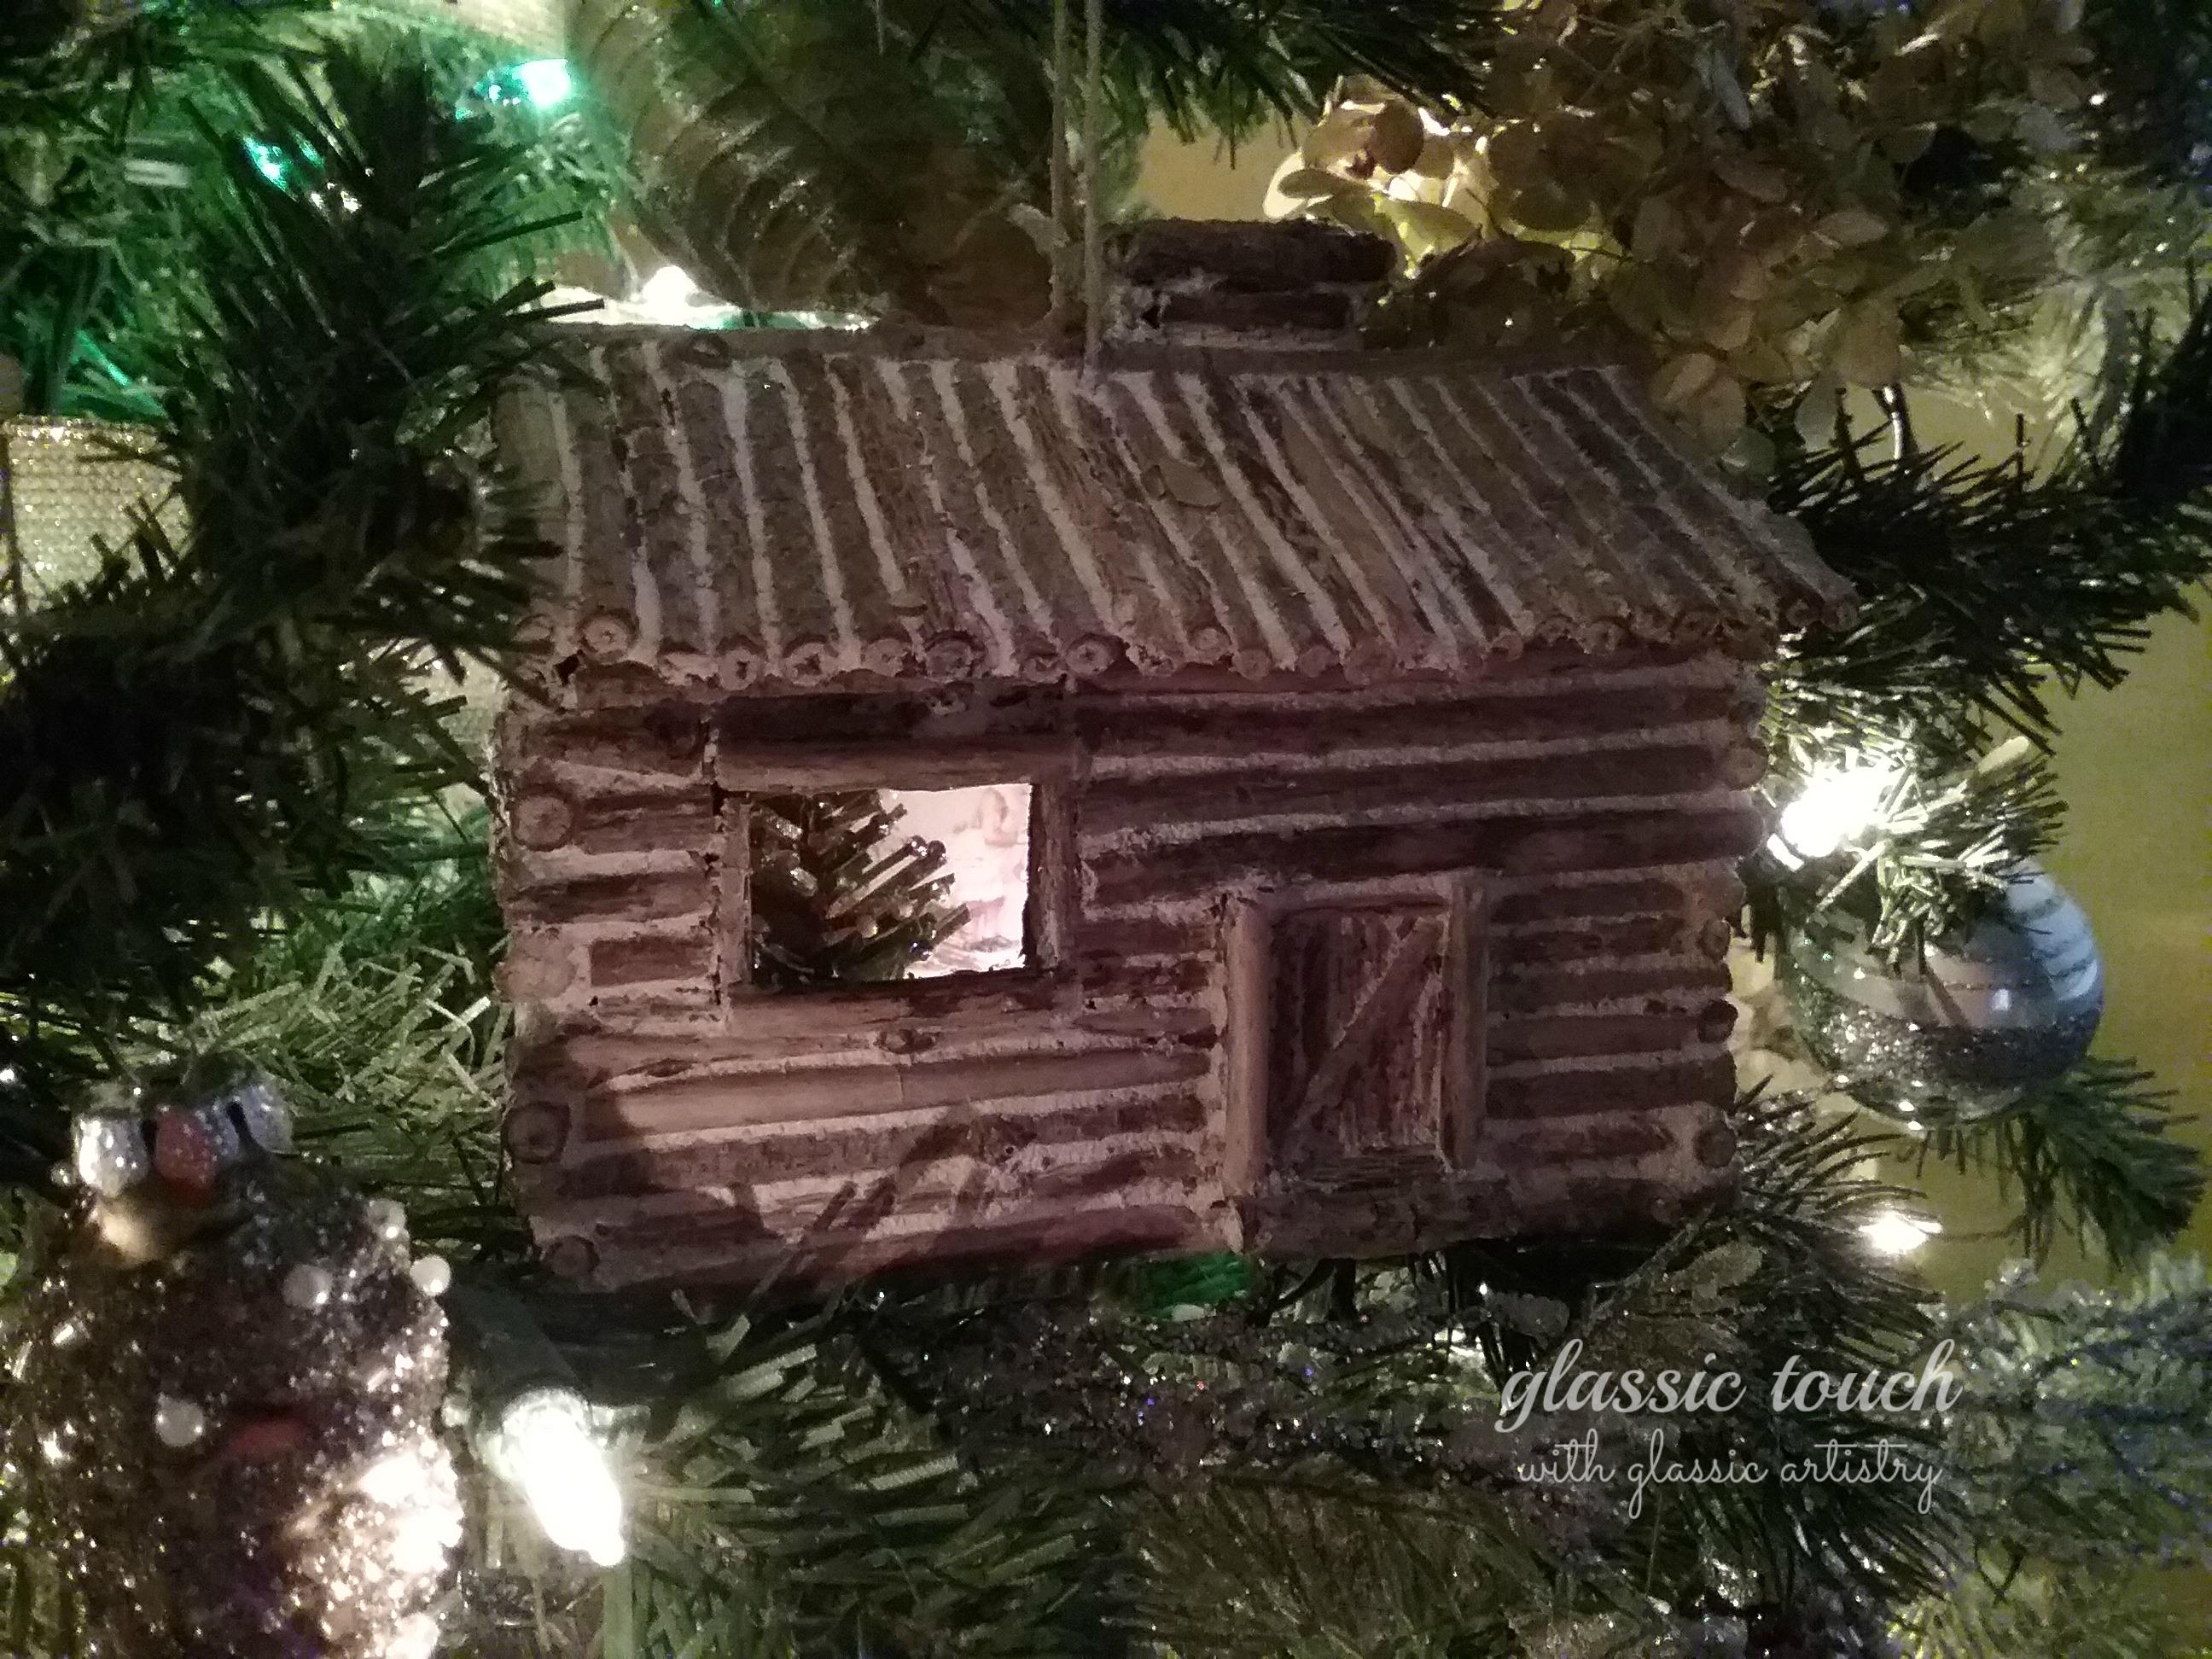 Miniature log cabin christmas tree ornament diy u glassic touch